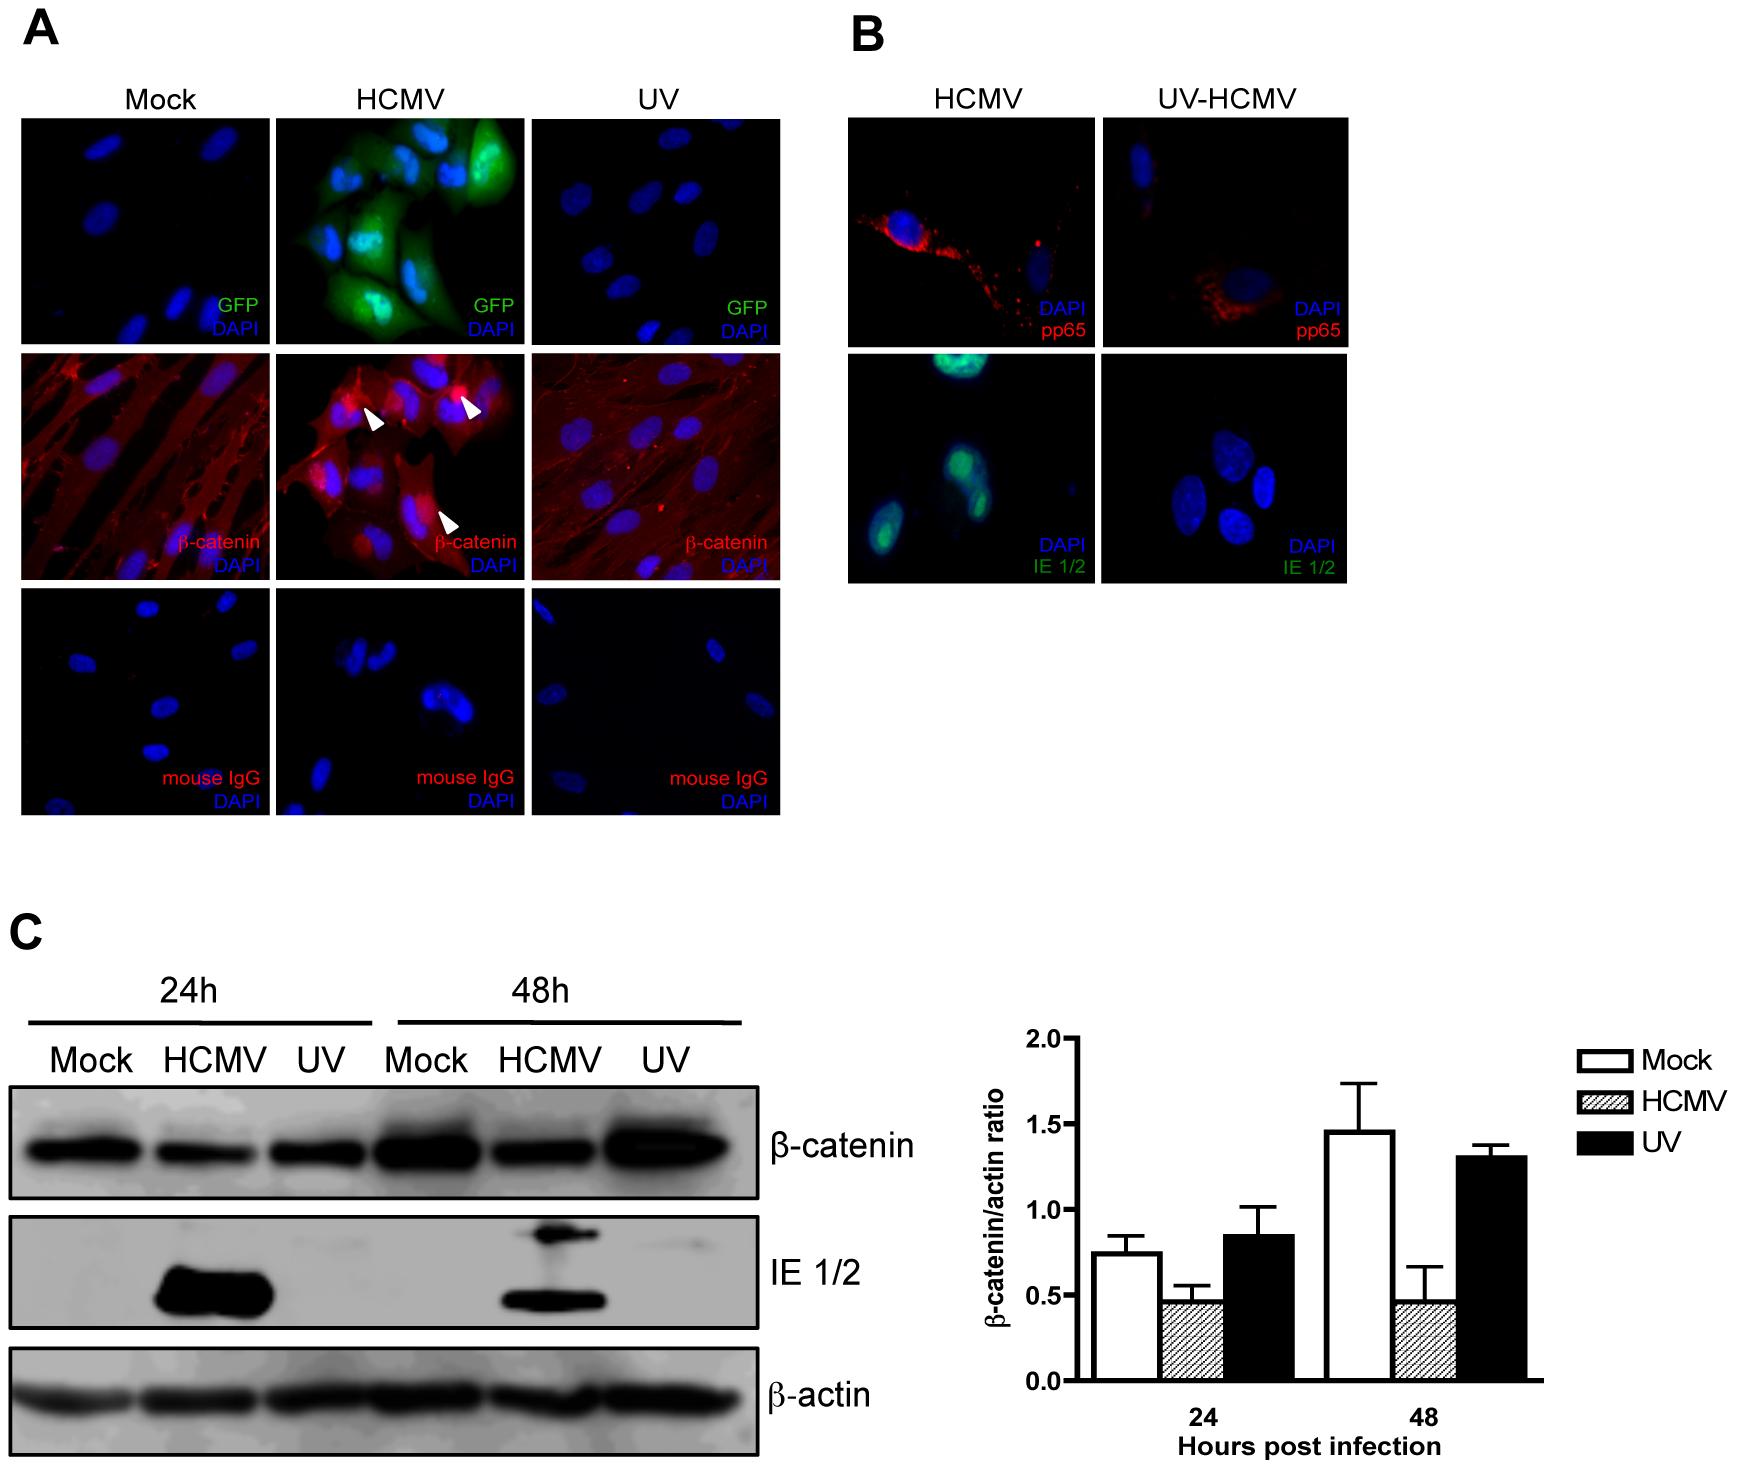 Effect of UV-inactivated HCMV on β-catenin degradation.